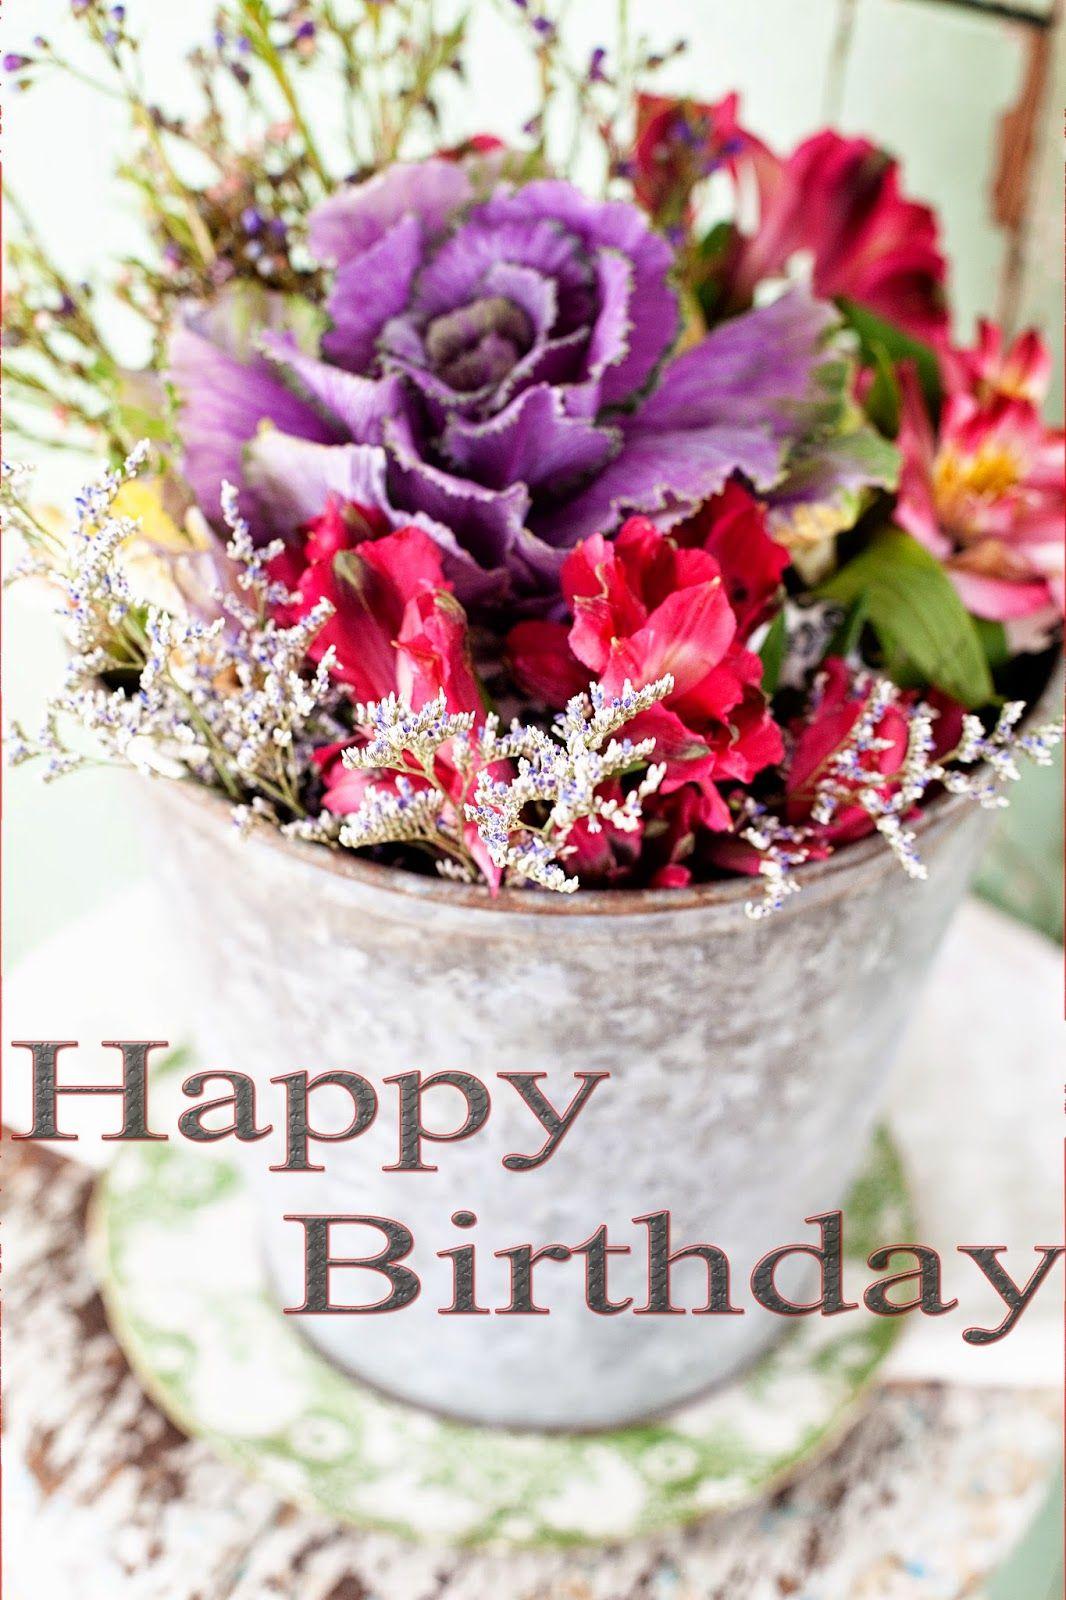 Happy birthday flowers images Birthday Sentiment